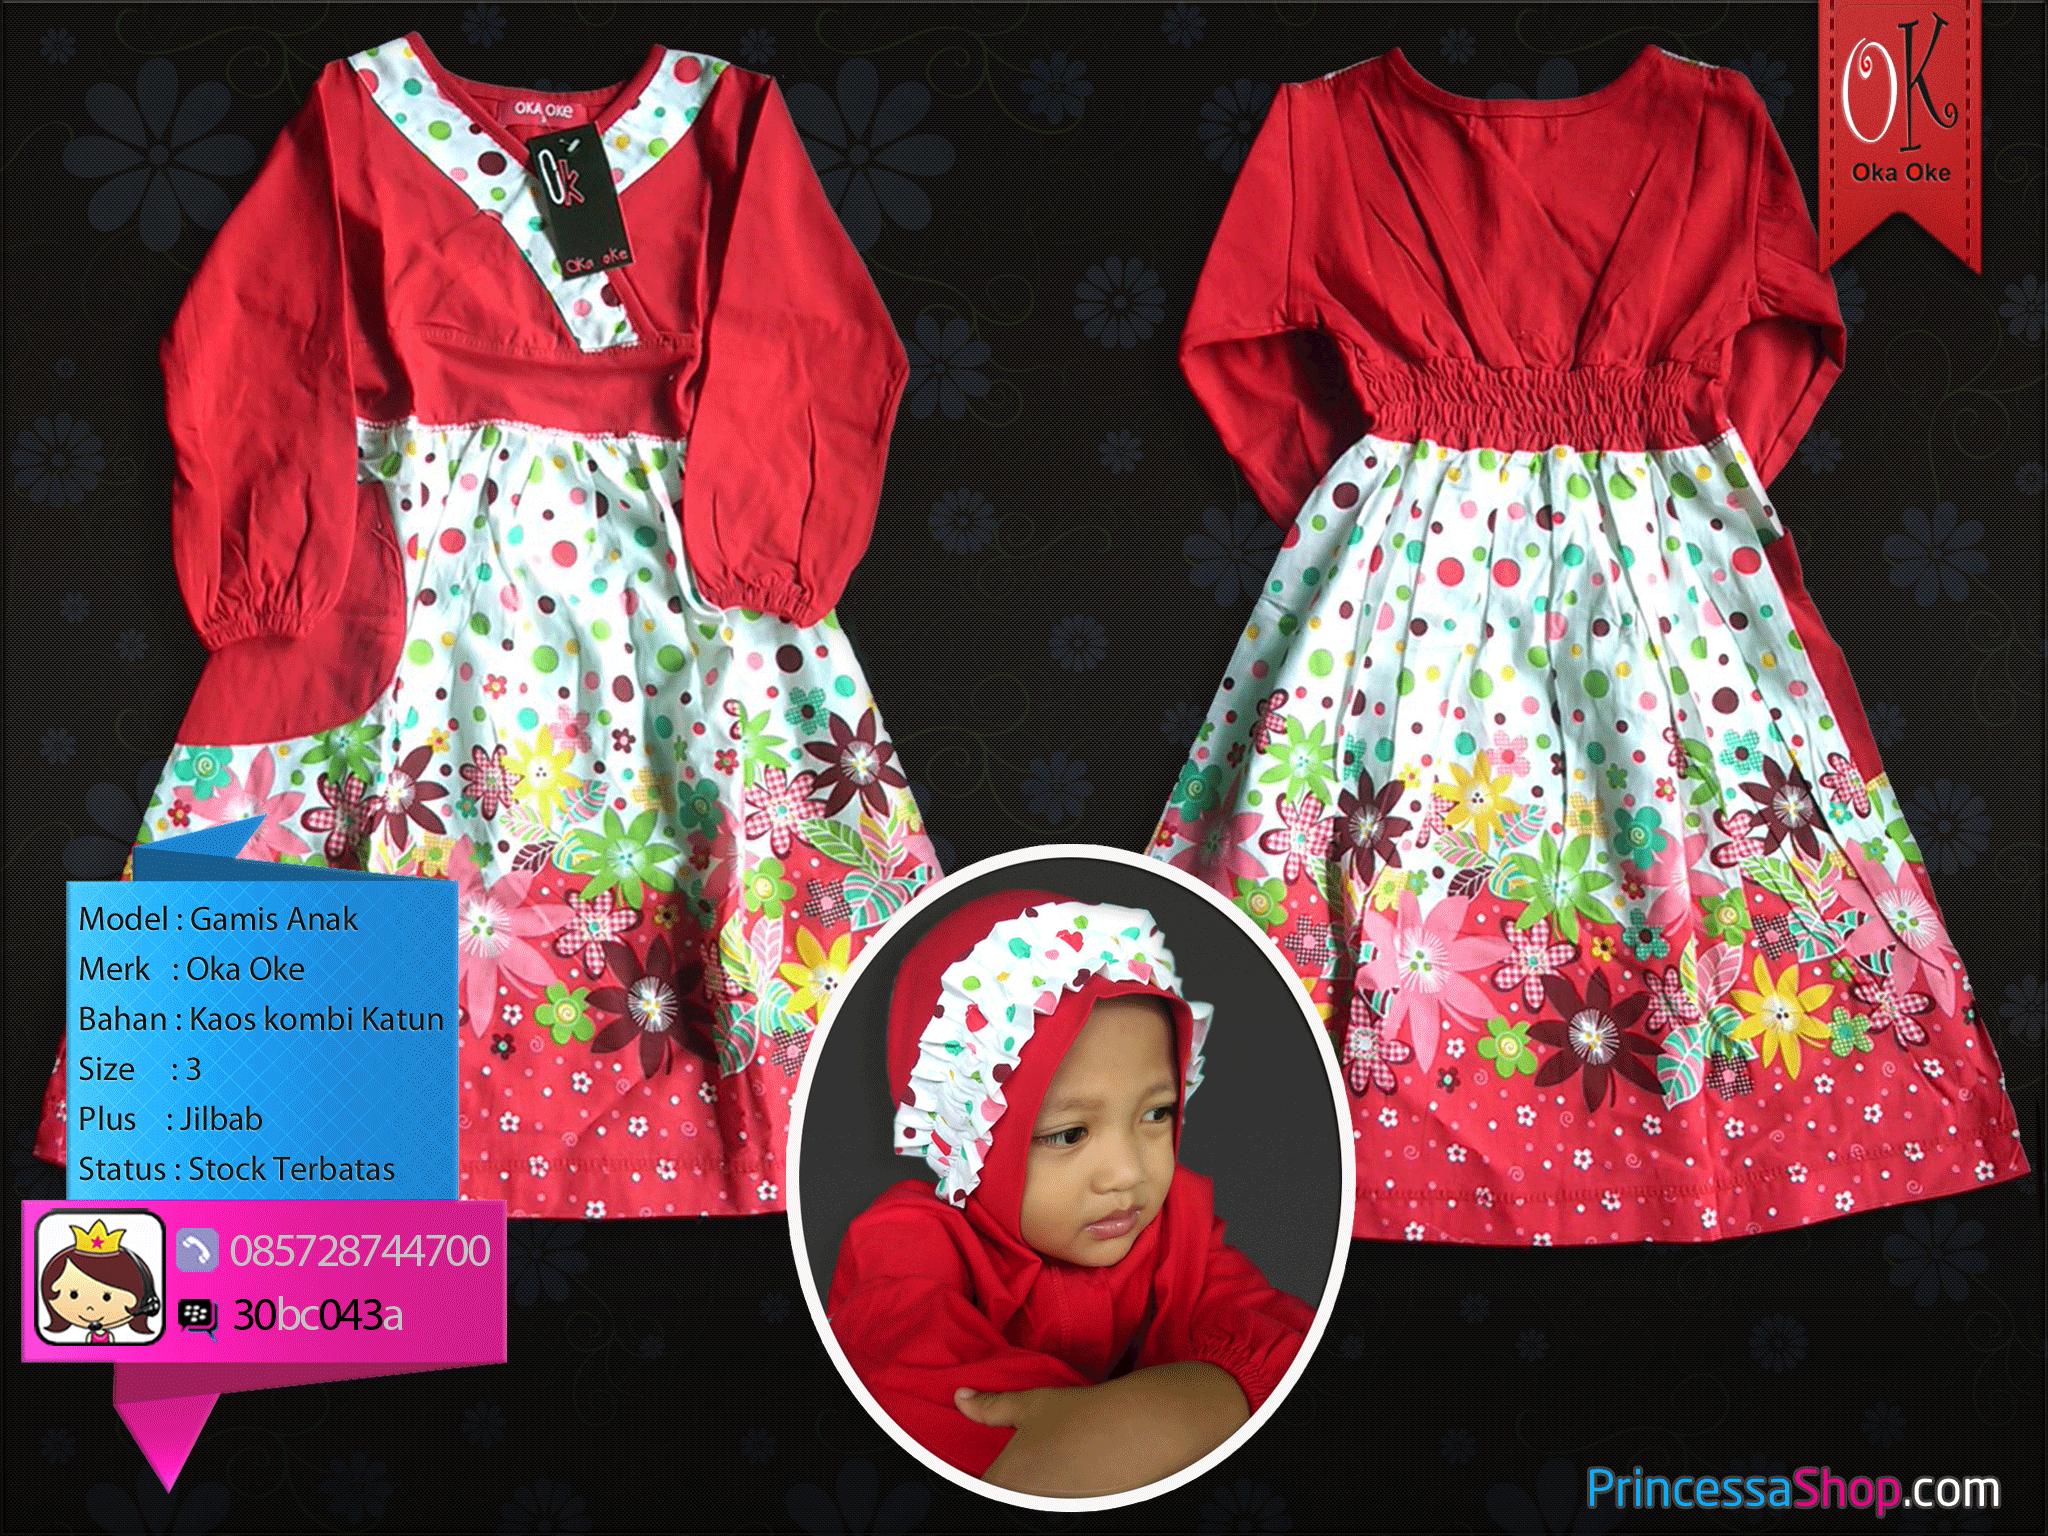 Grosir Baju Muslim Anak Perempuan Harga Murah Bahan Kaos Dan Katun